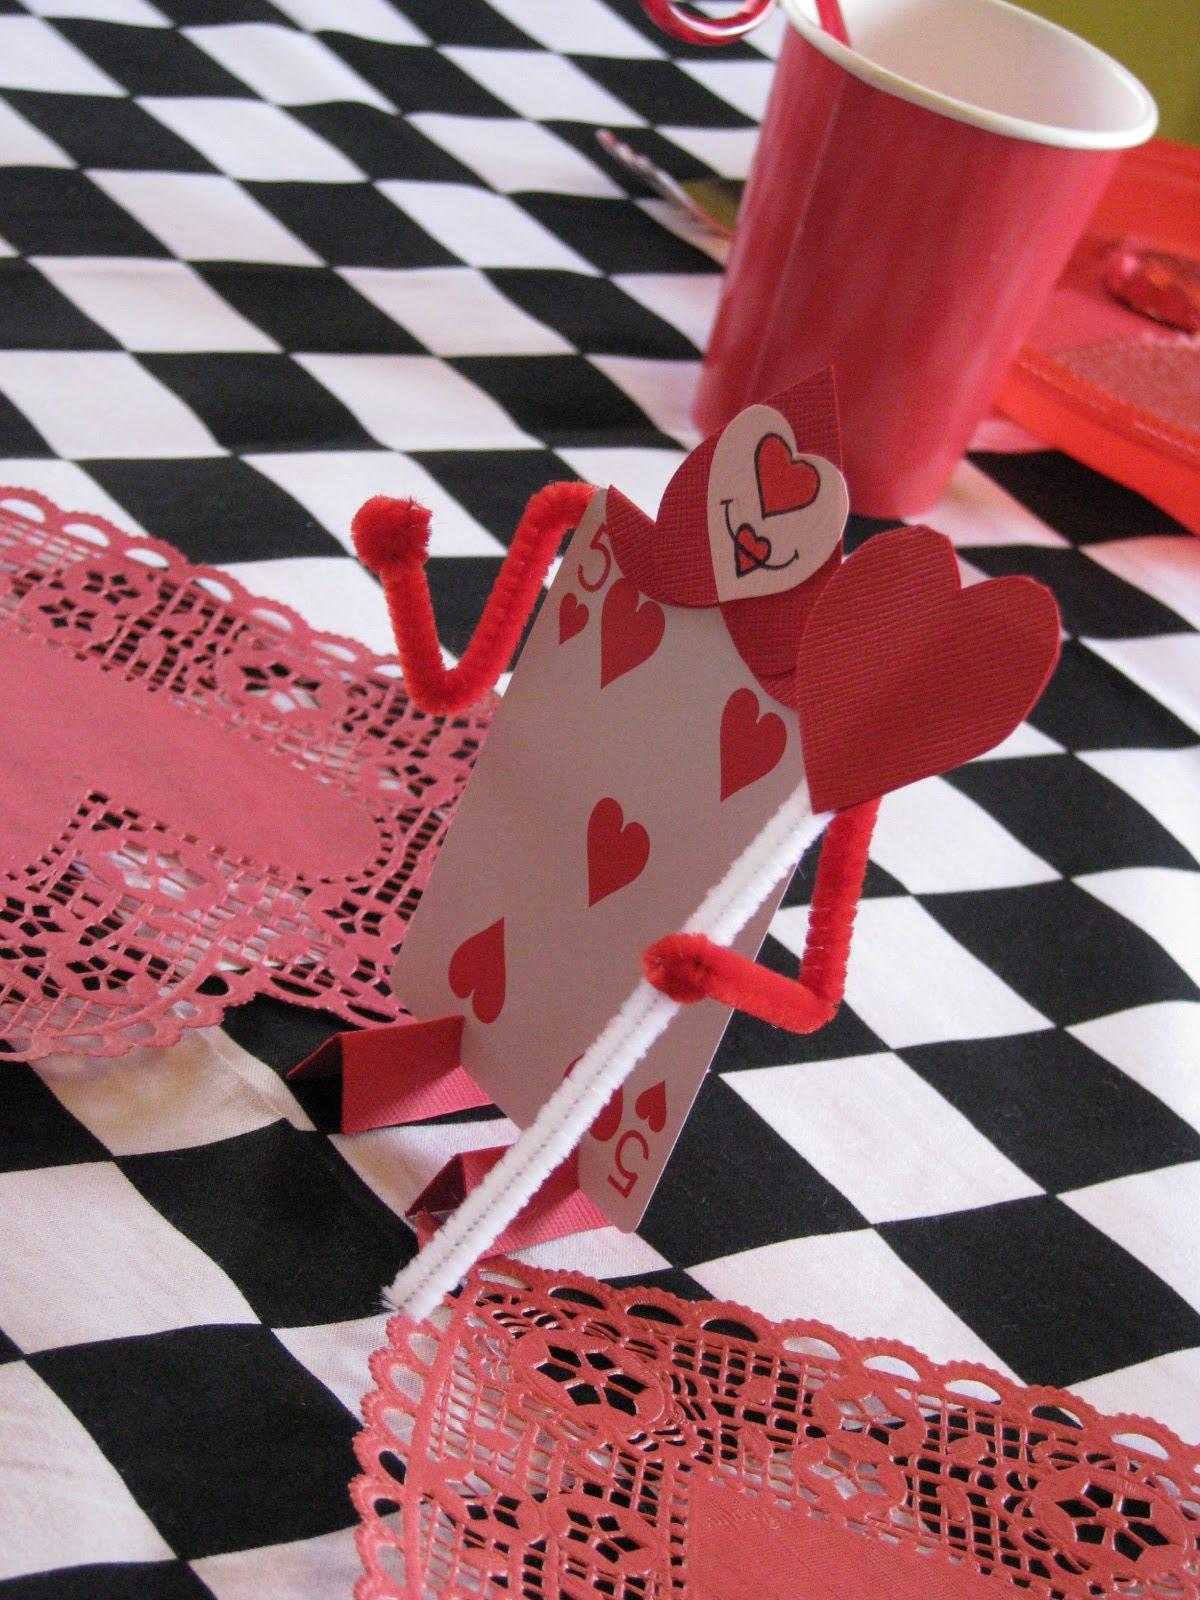 alice in wonderland card soldiers template - making merry memories alice in wonderland party